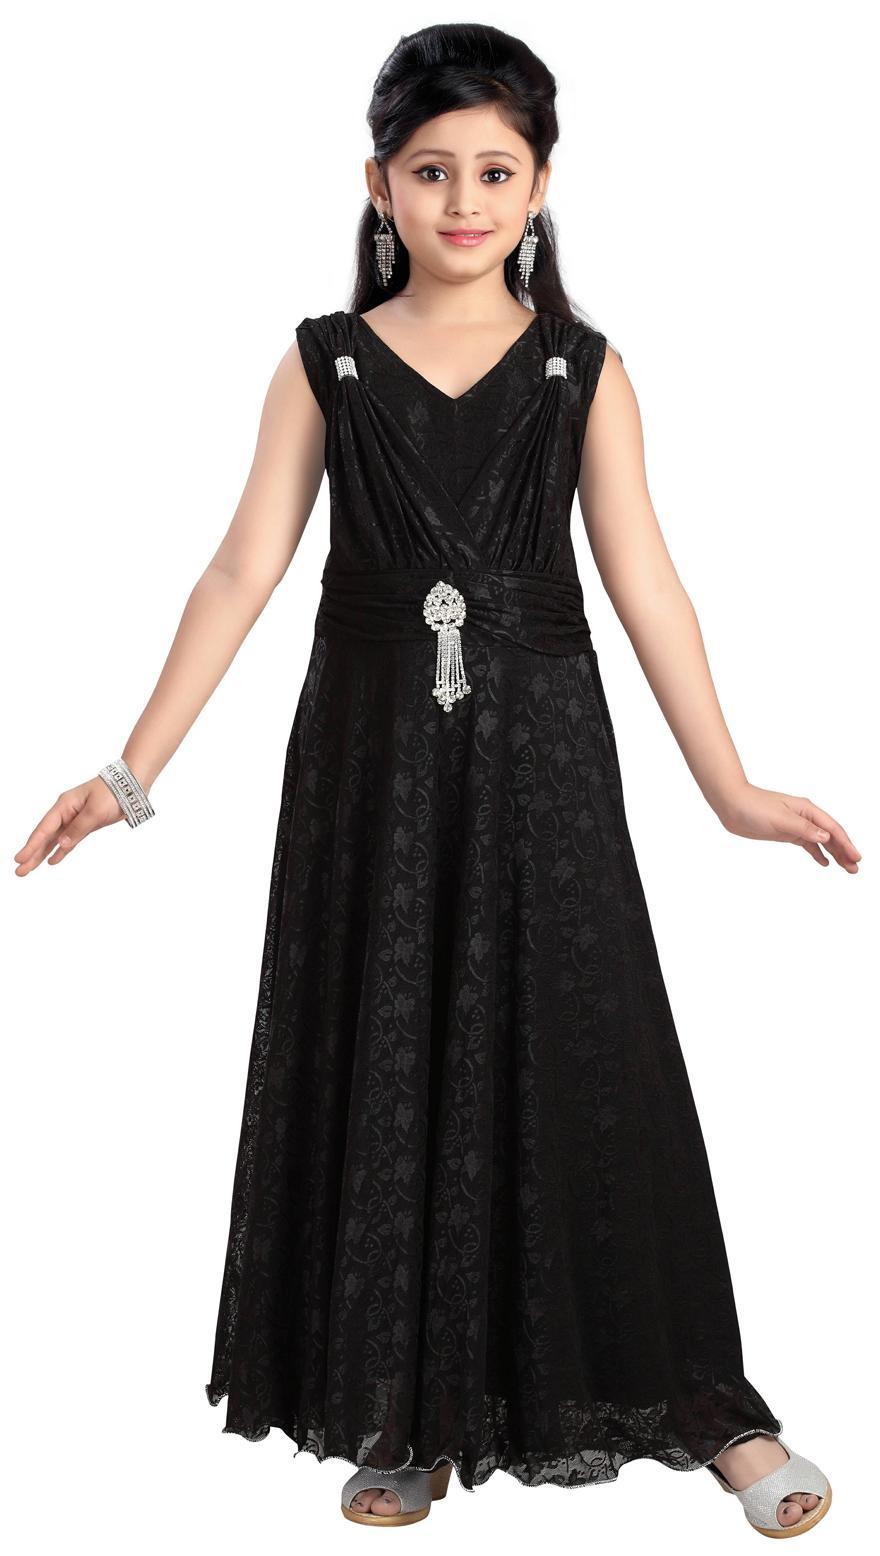 d296c7a76 Buy Aarika Girl s Birthday Special Premium Net Gown (7 - 8 Years ...